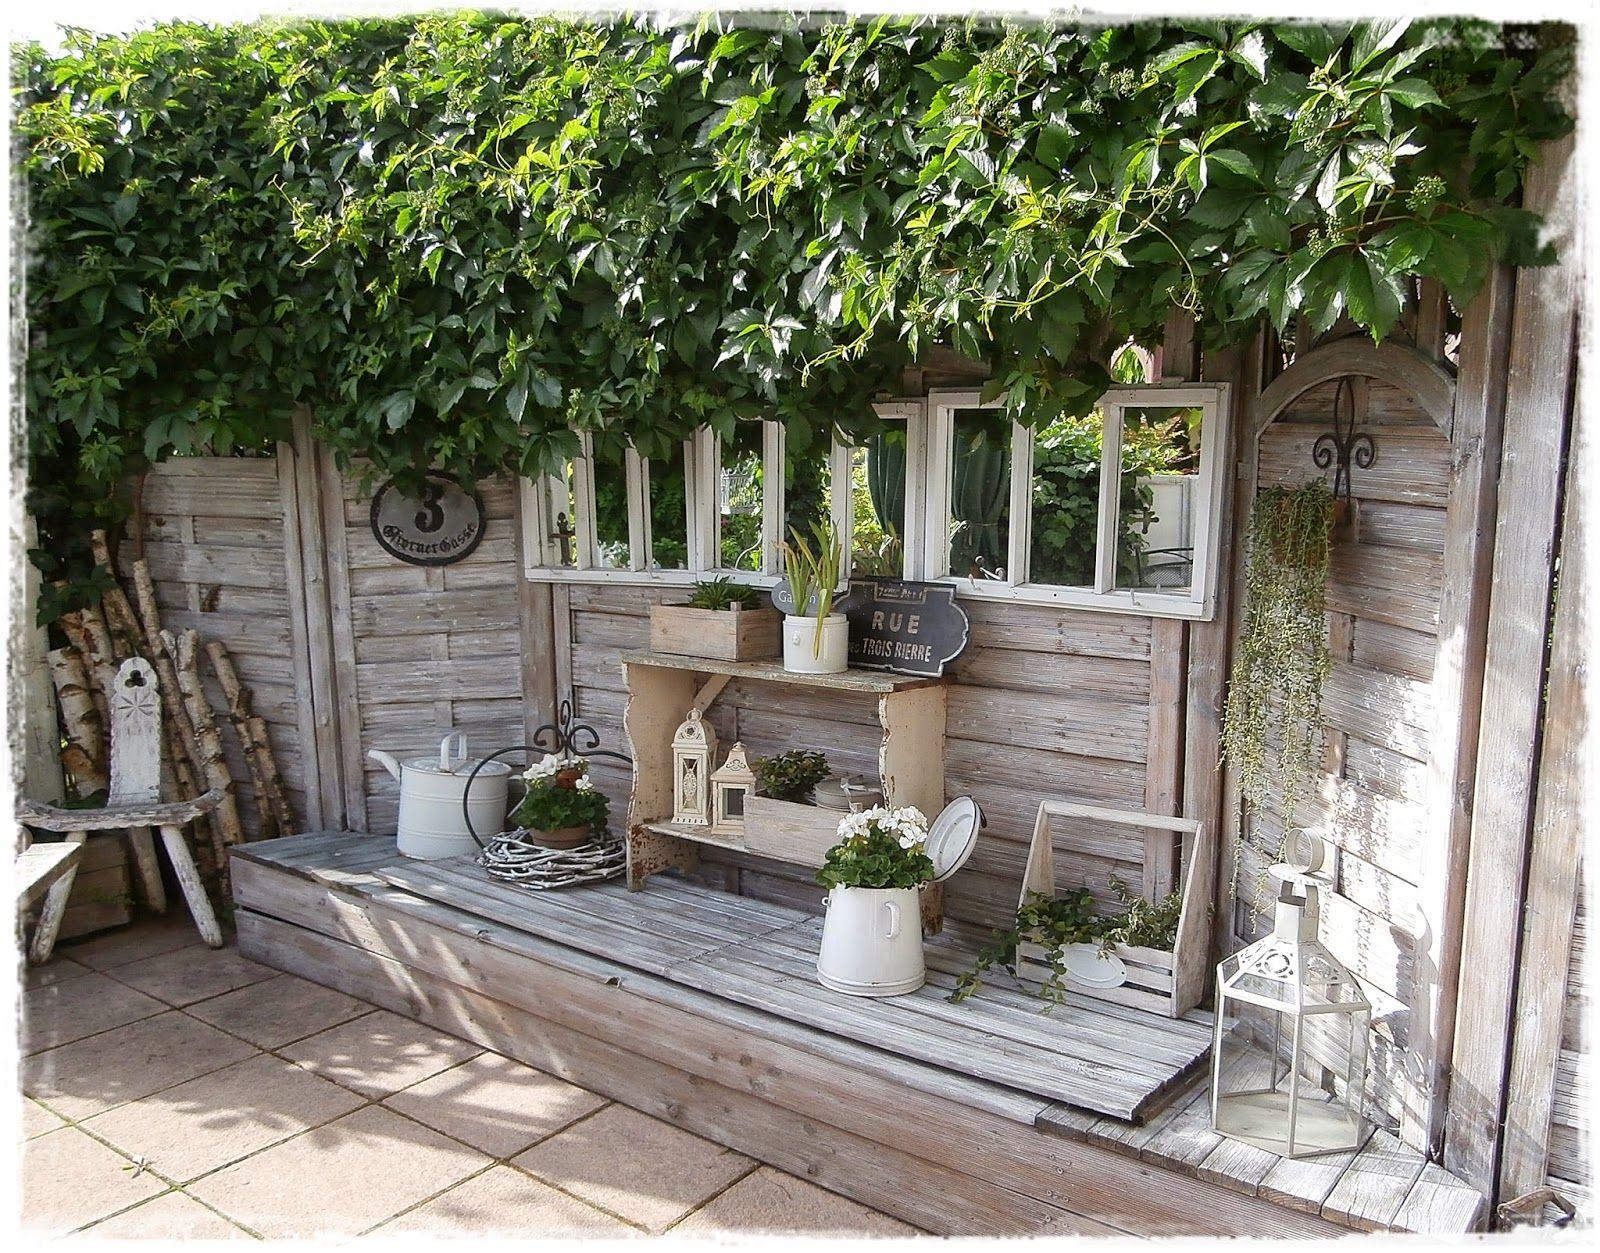 shabby landhaus d rzs pinterest garten garten ideen und garten deko. Black Bedroom Furniture Sets. Home Design Ideas